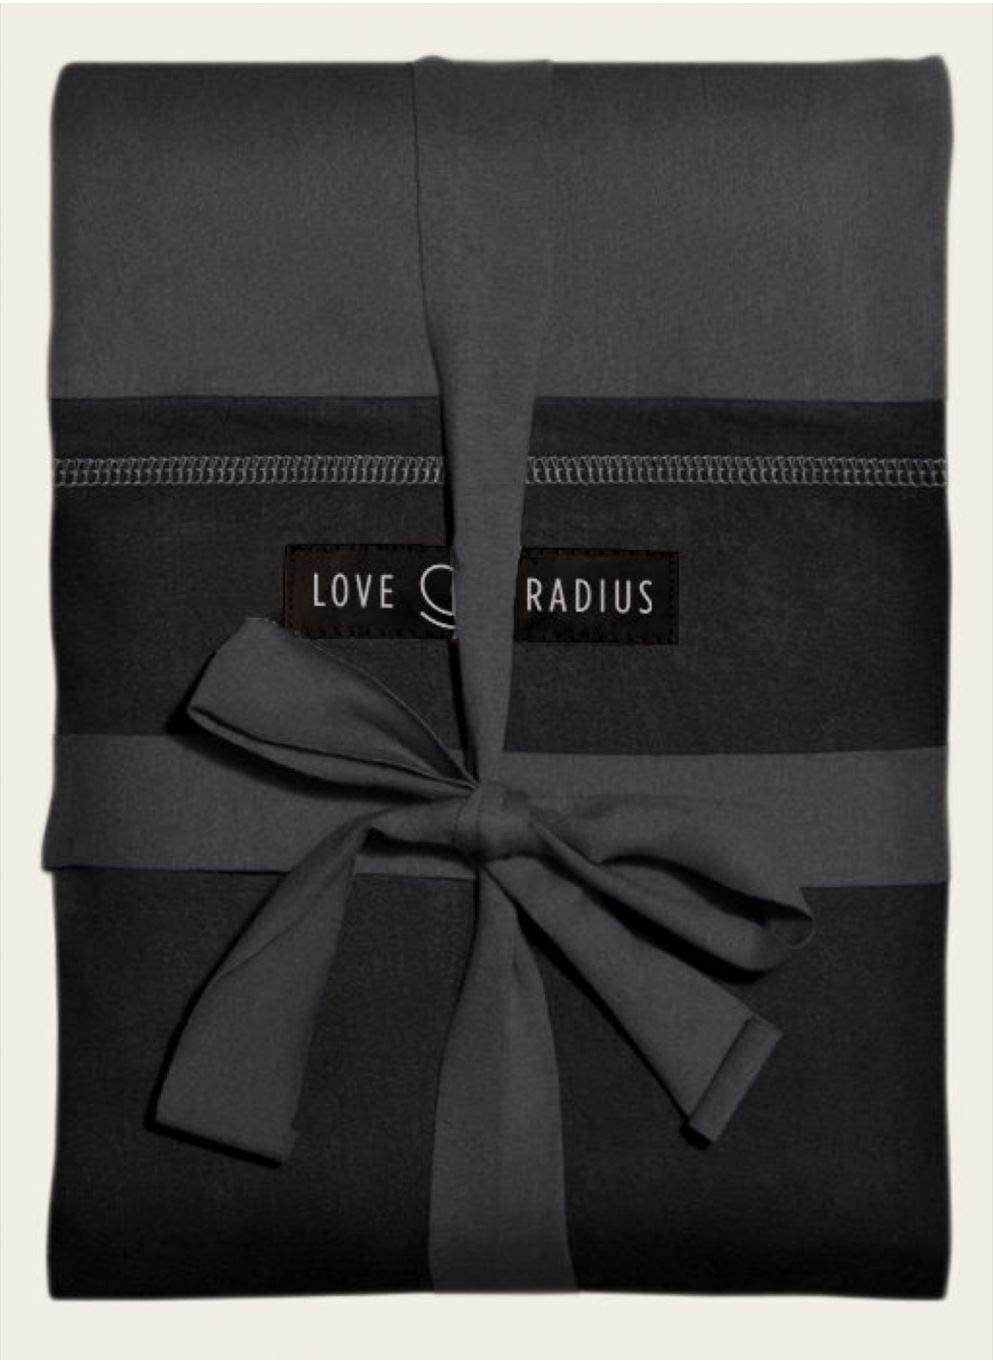 Love Radius LOriginale JPMBB /Écharpe de portage NOIR poche Noir